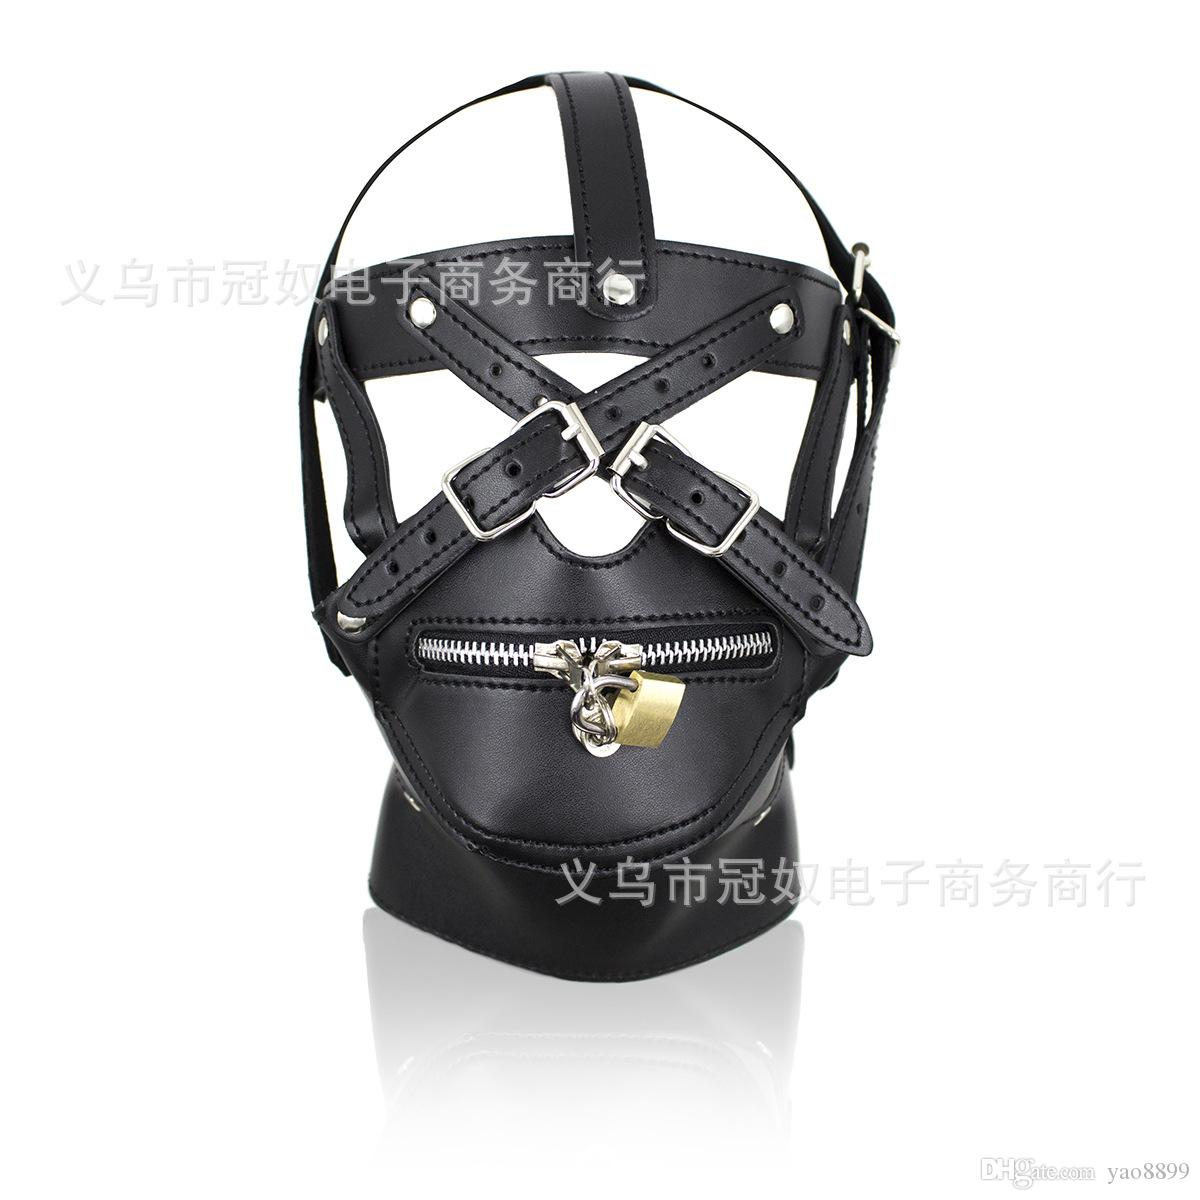 Sexuelstoys Sex Toys Black Leather Head Harness Muzzle With For Product Sex Leather Bondage Adult Restraint Muzzle S778jouets BDSM Gear Uupj